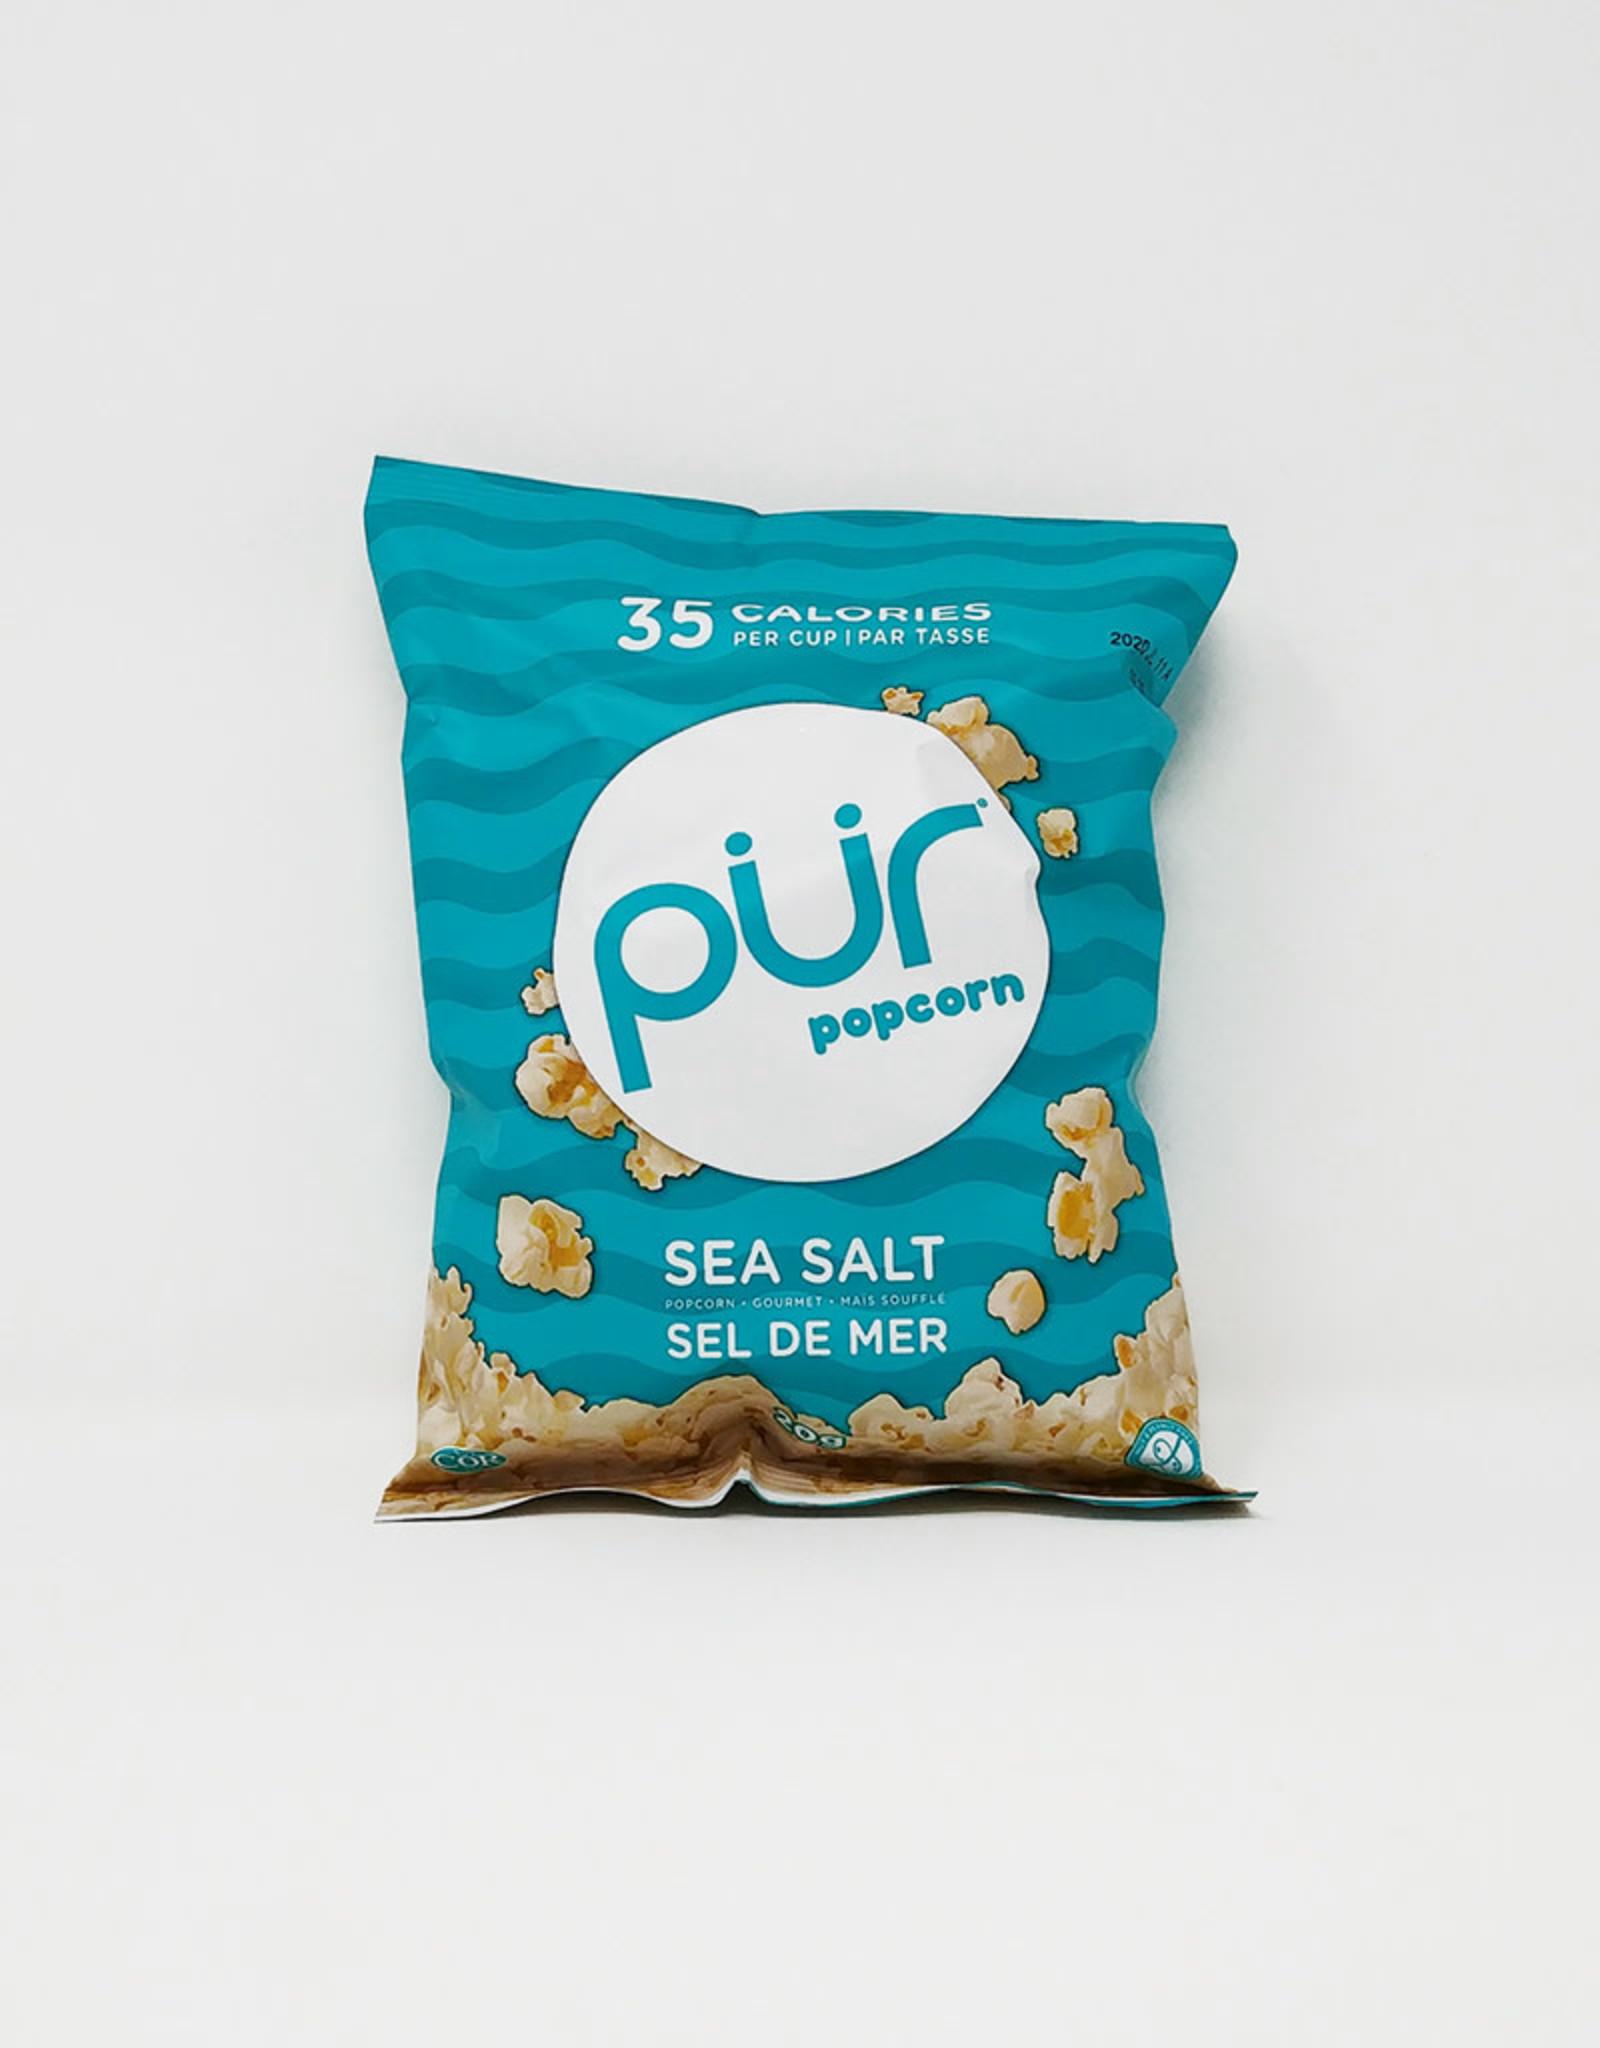 PUR PUR - Popcorn, Sea Salt (20g)